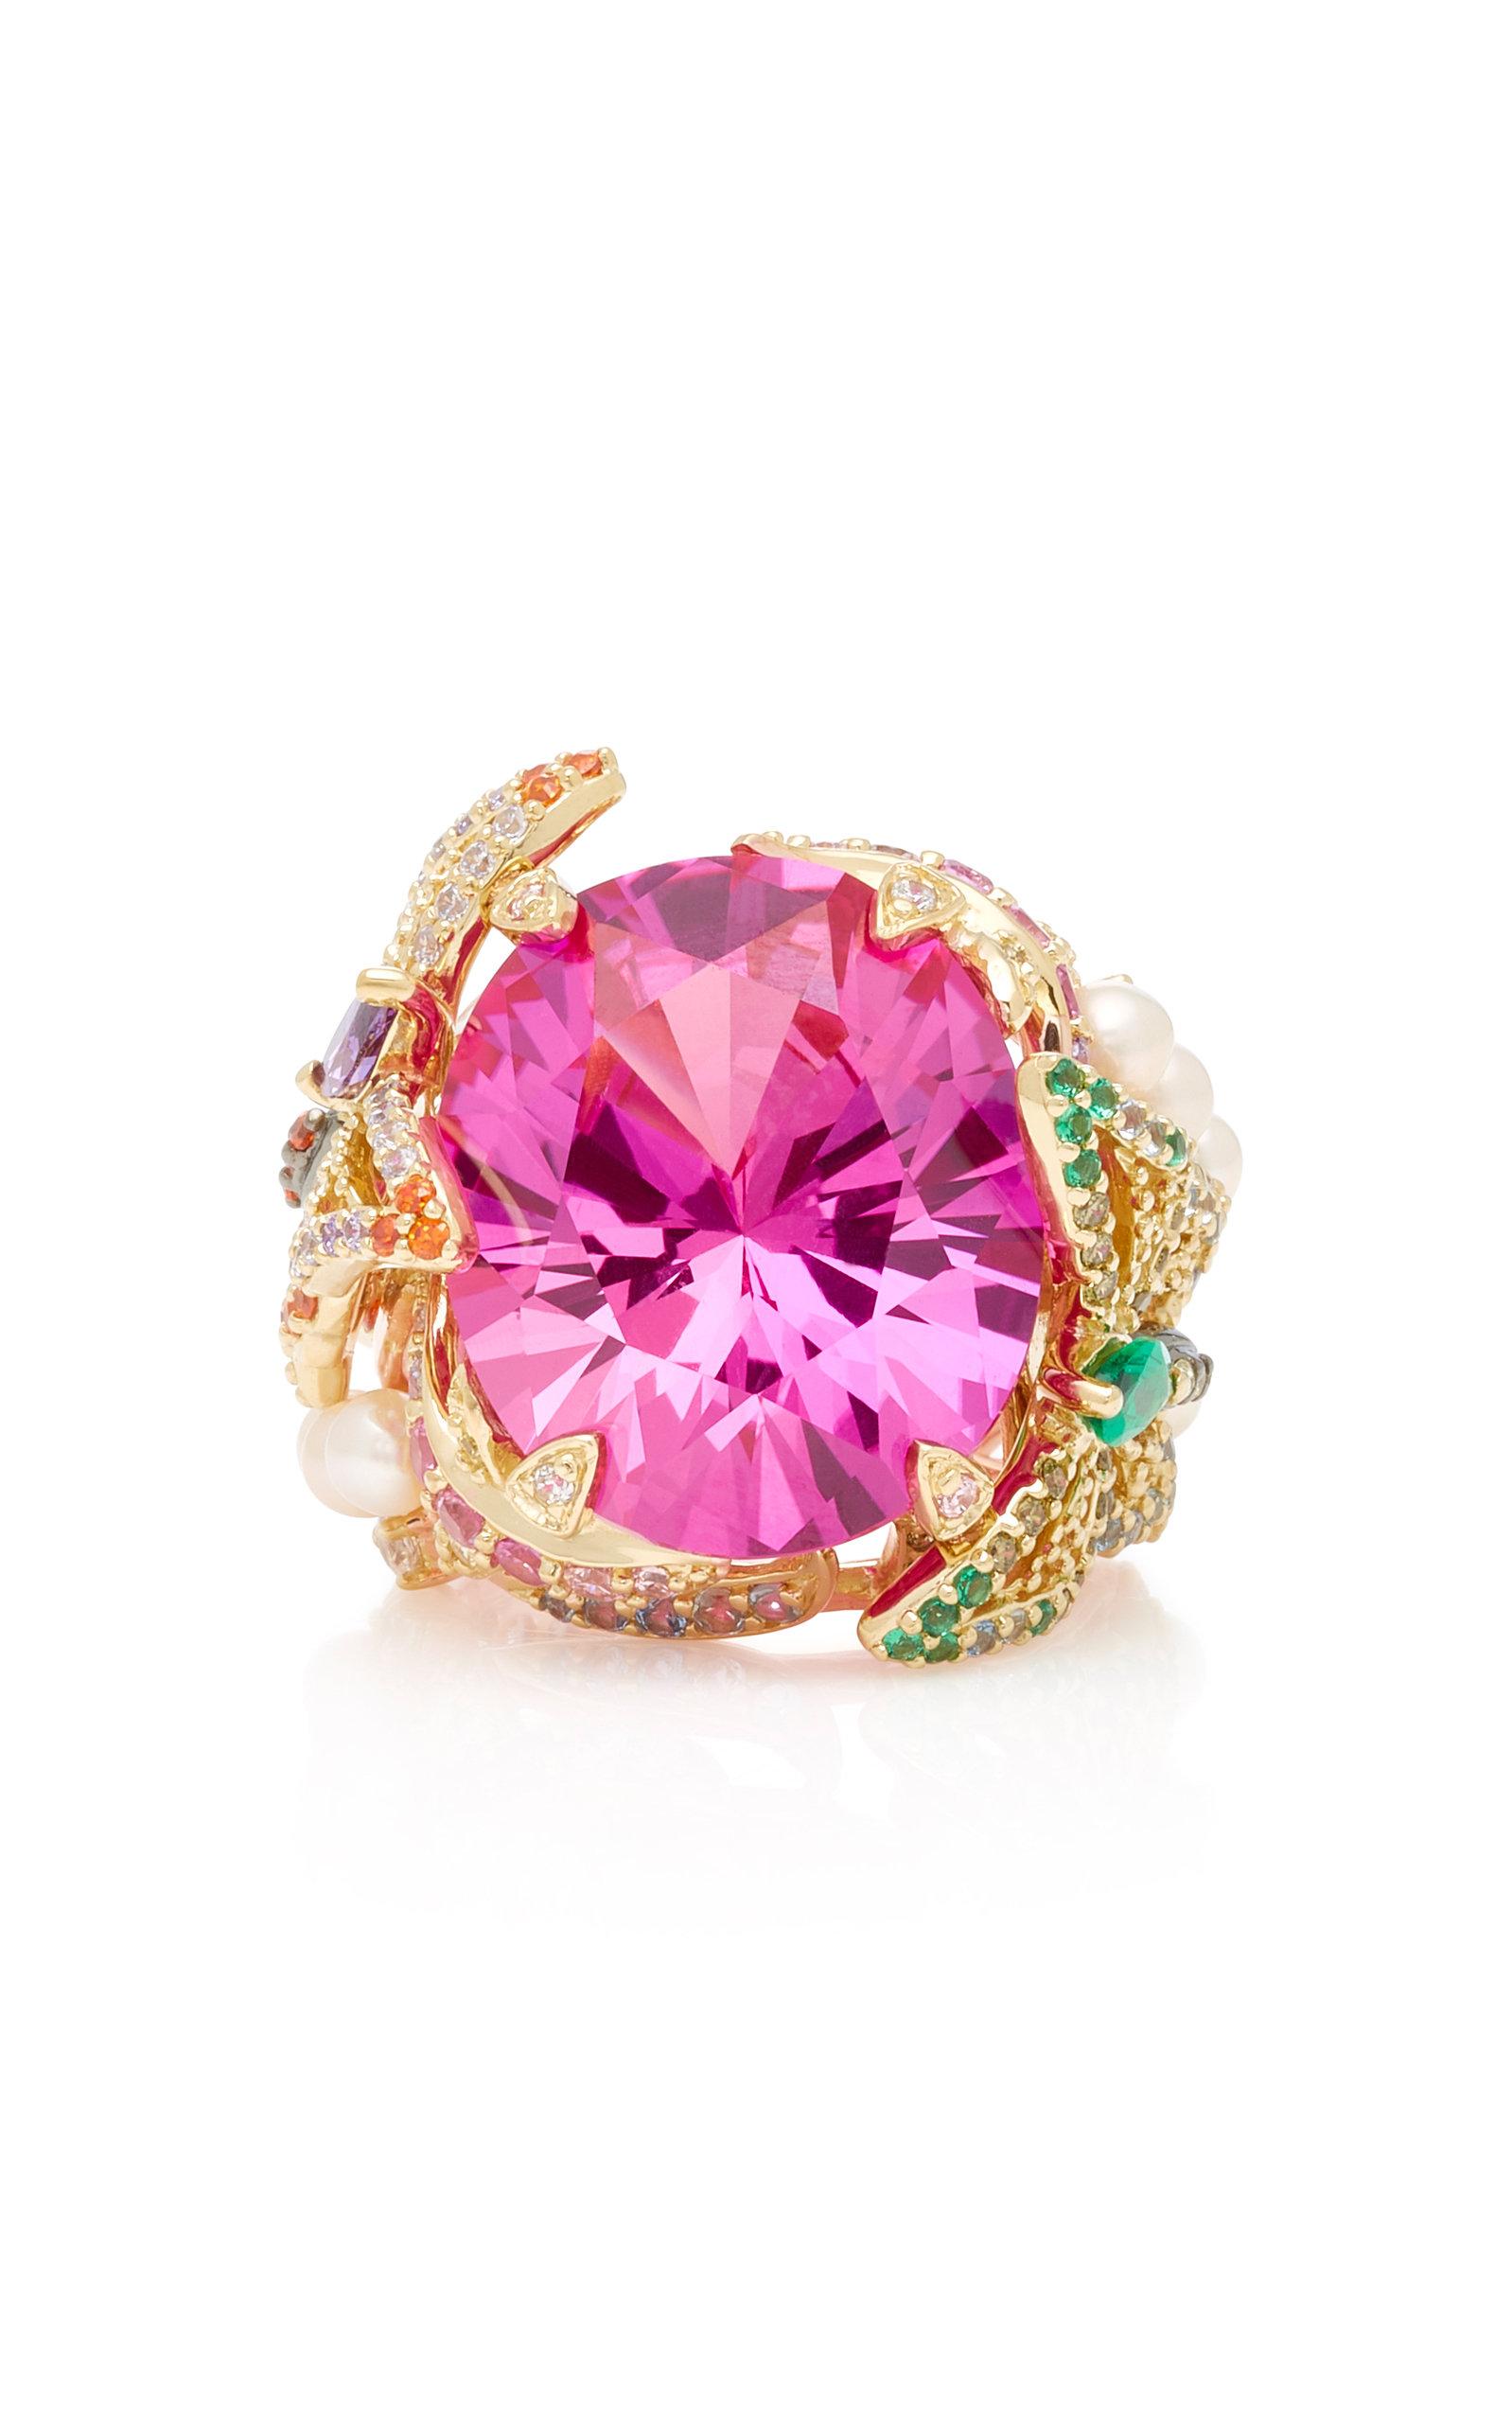 Rose Swallowtail Pink Sapphire Ring Anabela Chan av3FK2MK